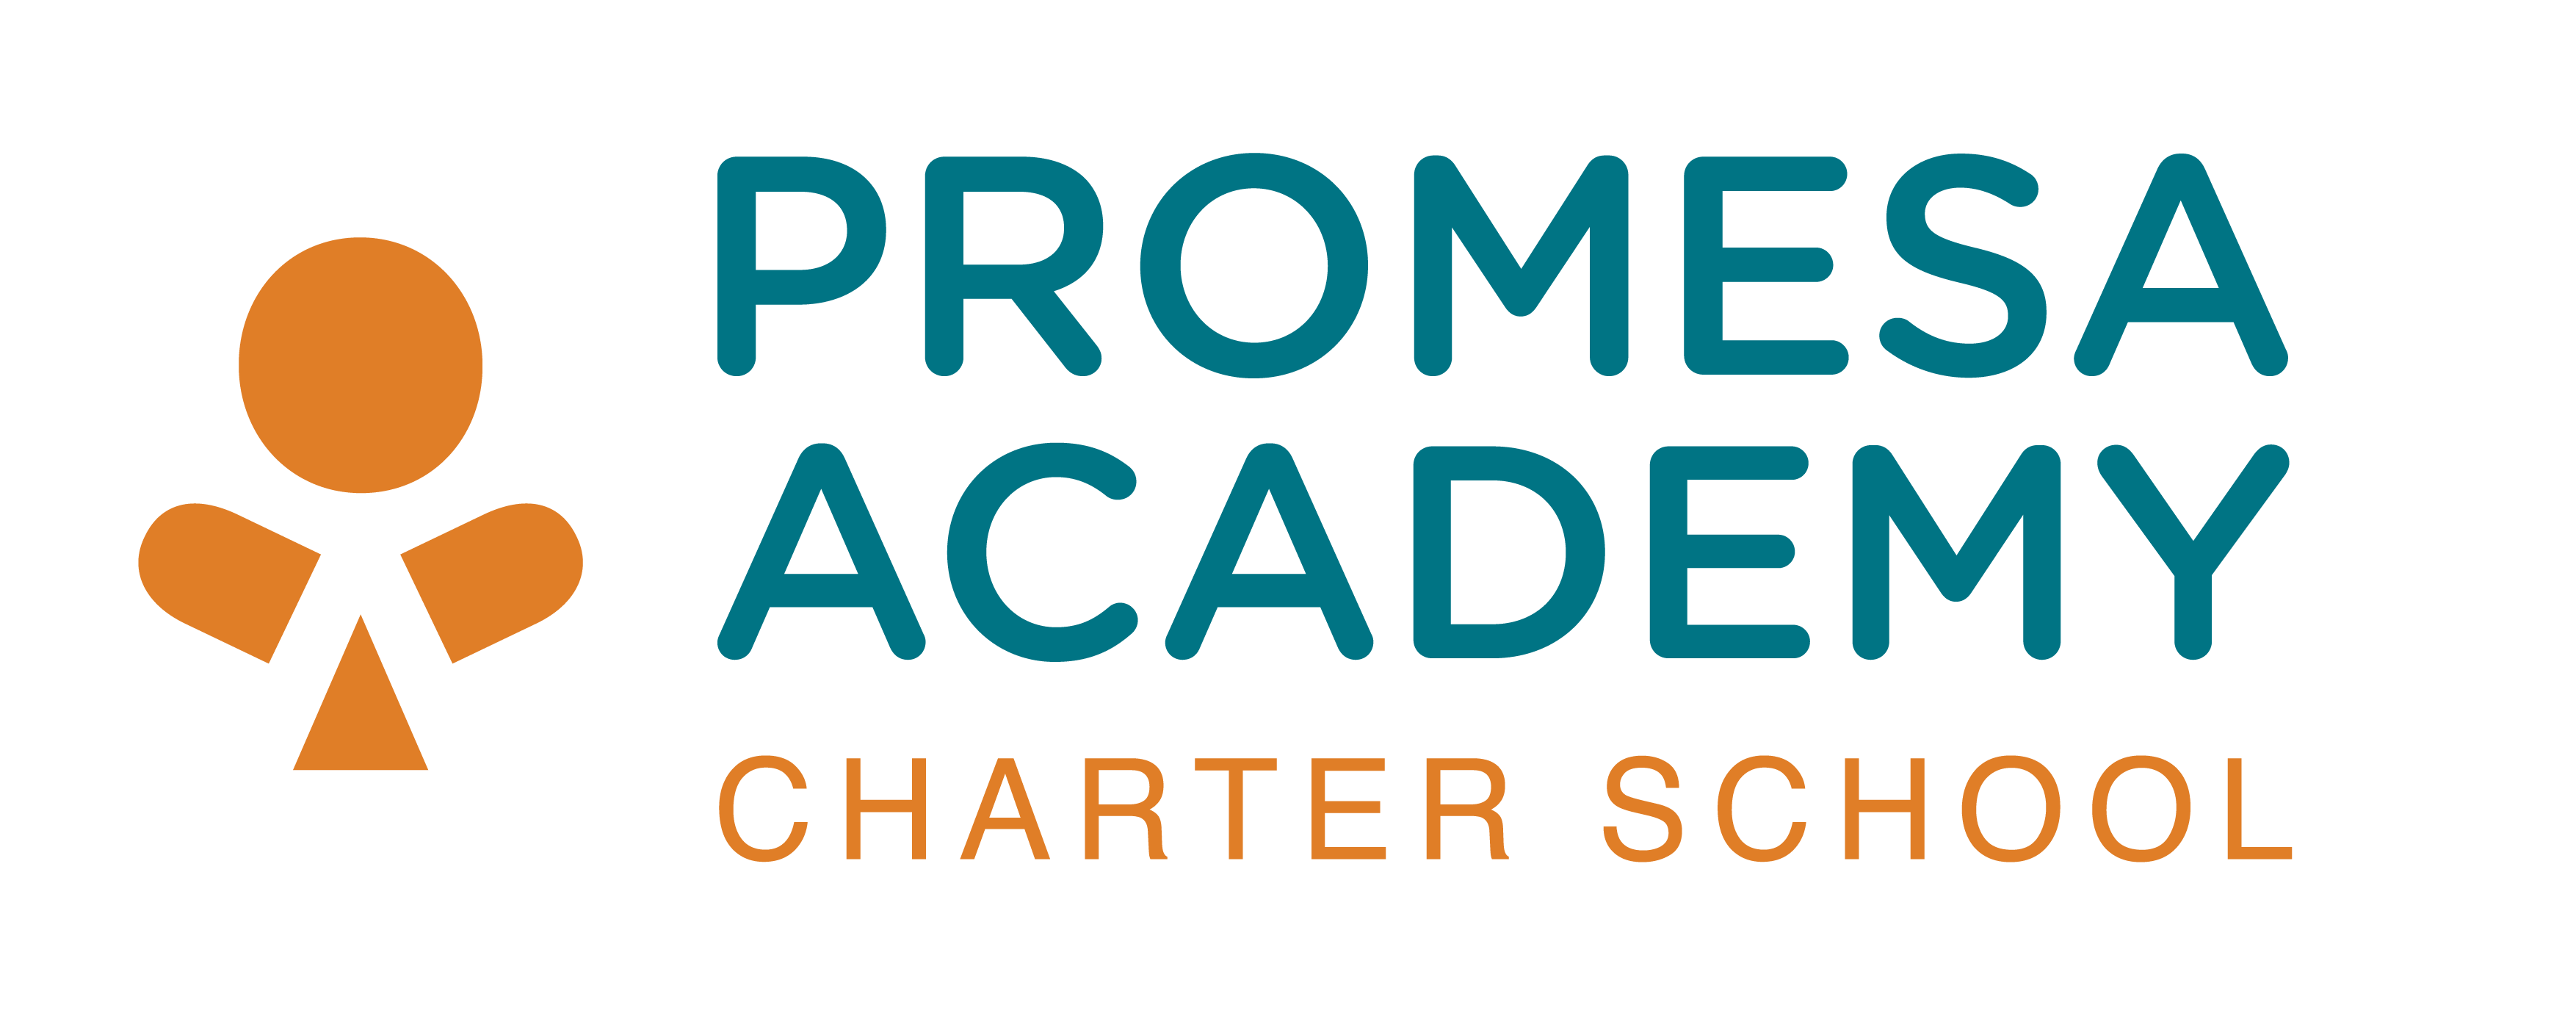 Promesa Academy logo